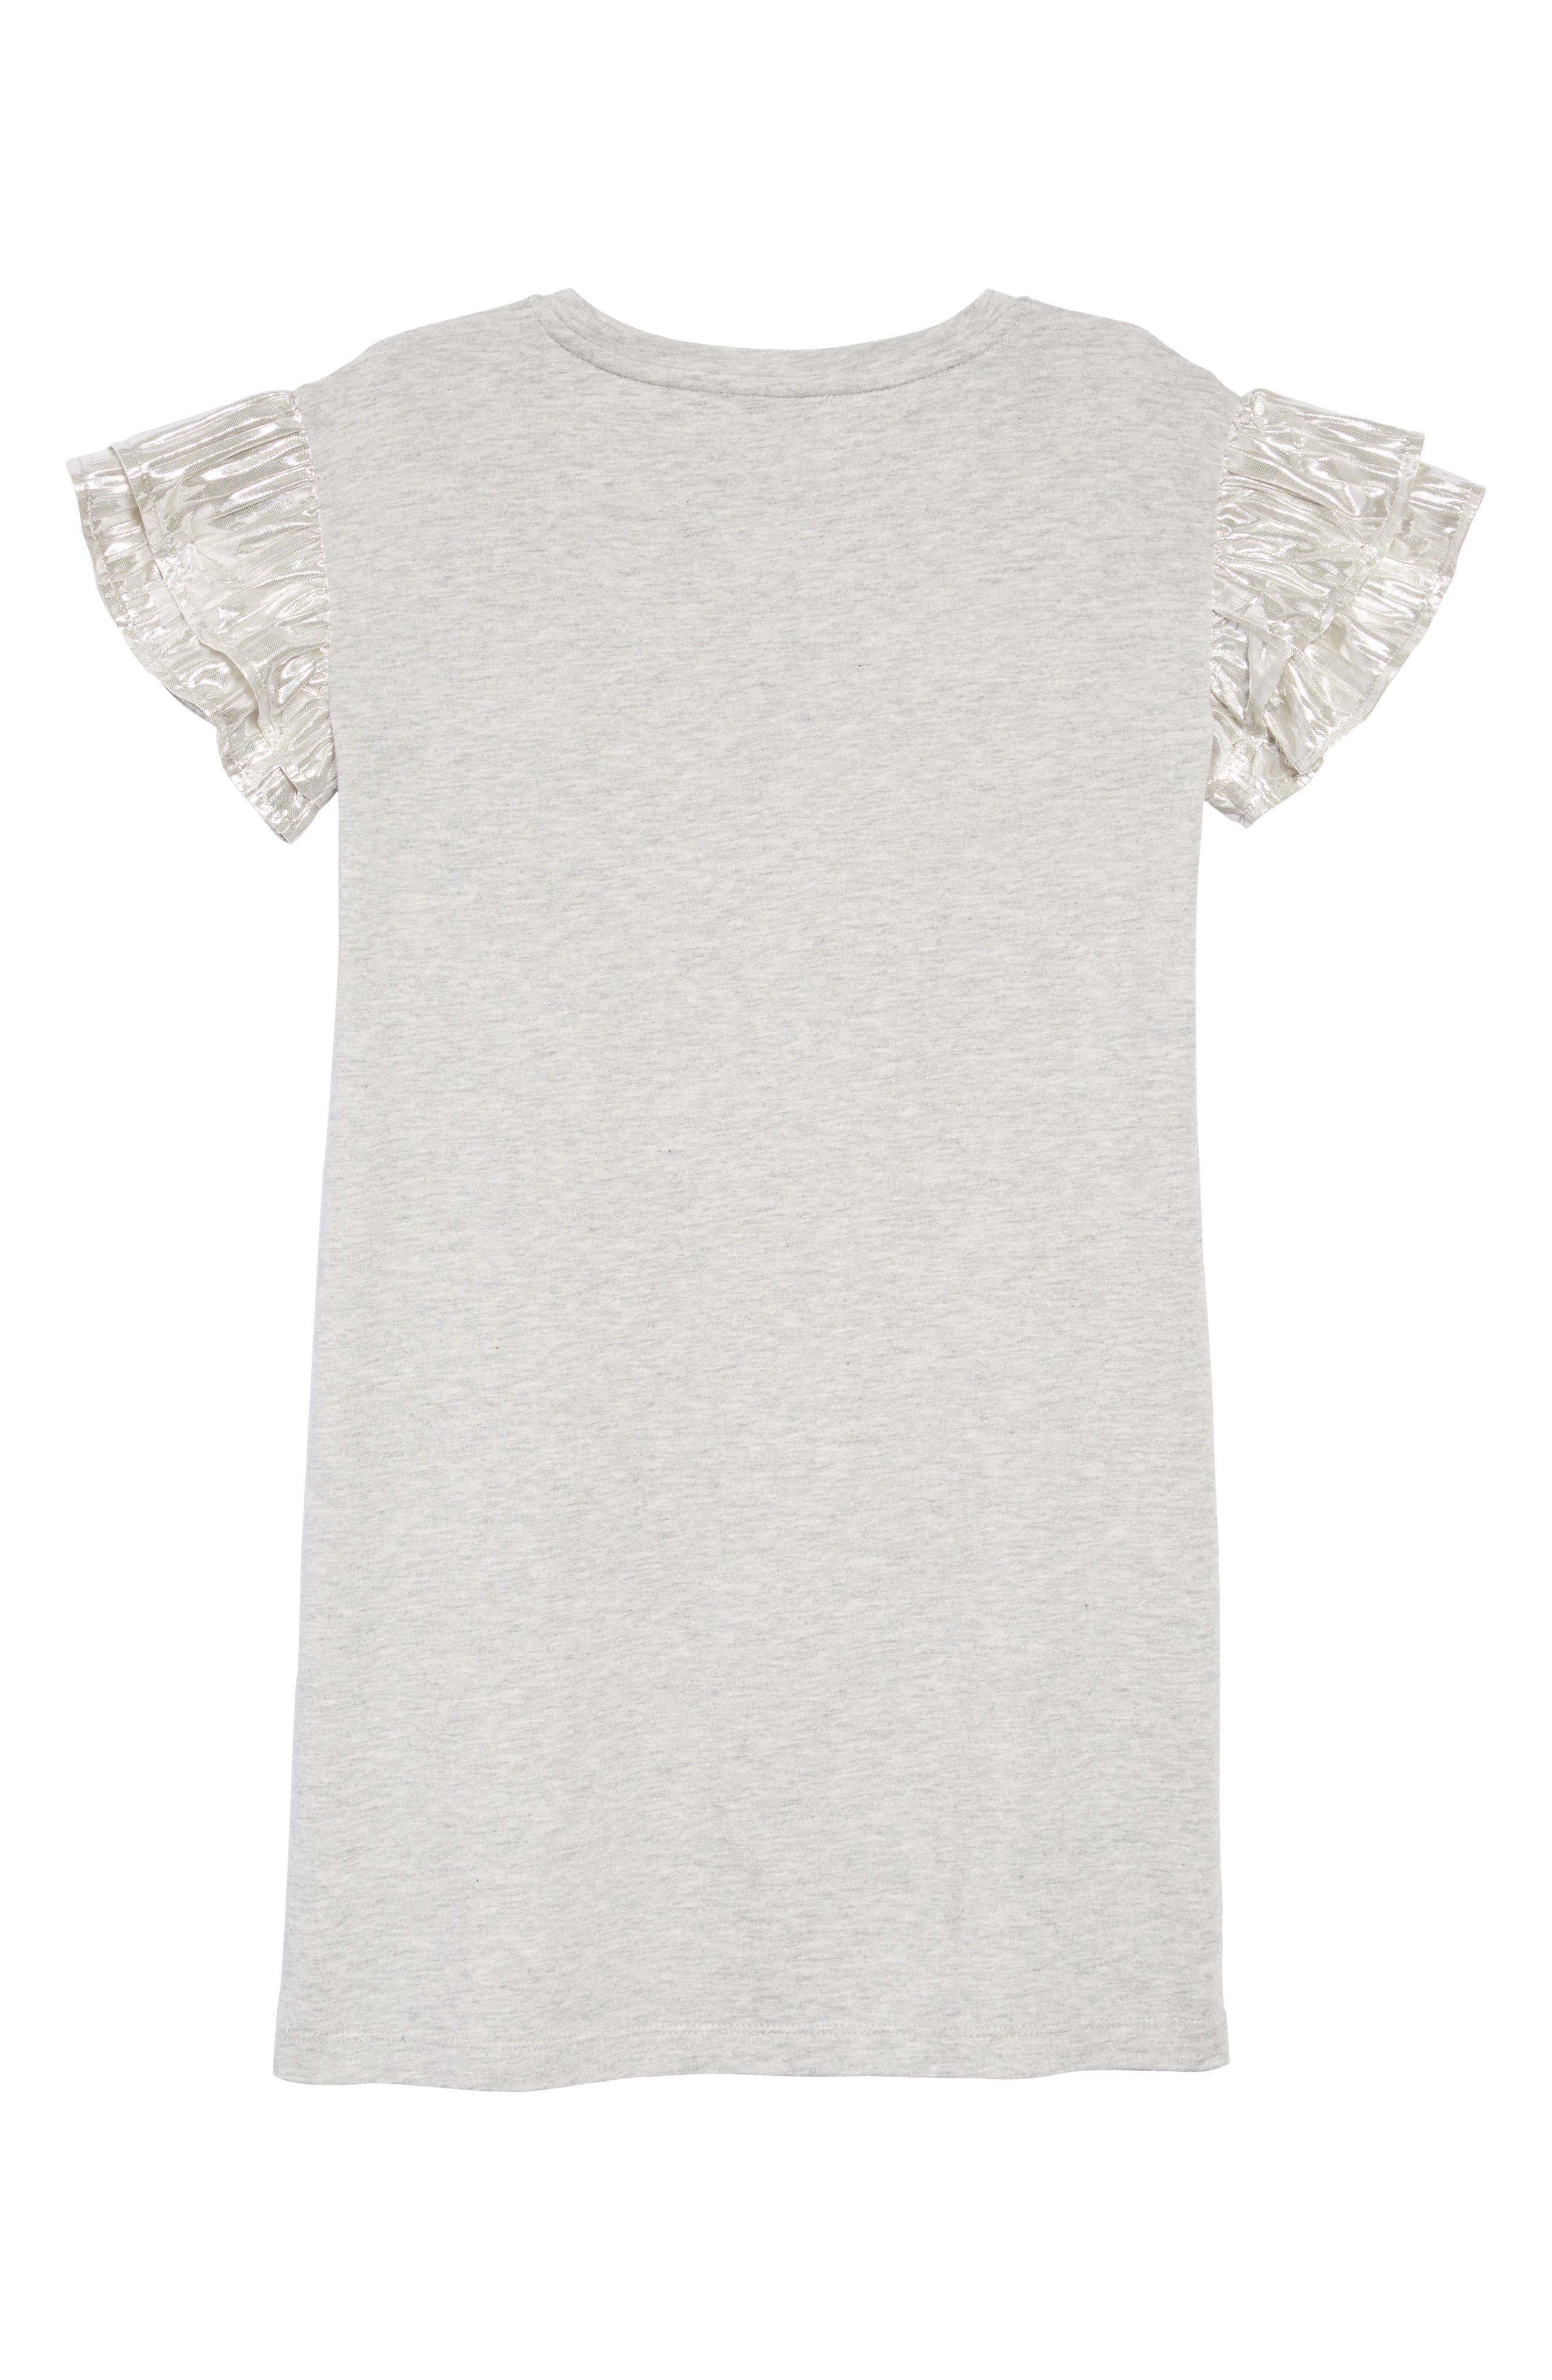 T-Shirt Dress,                             Alternate thumbnail 2, color,                             HEATHER DUSK